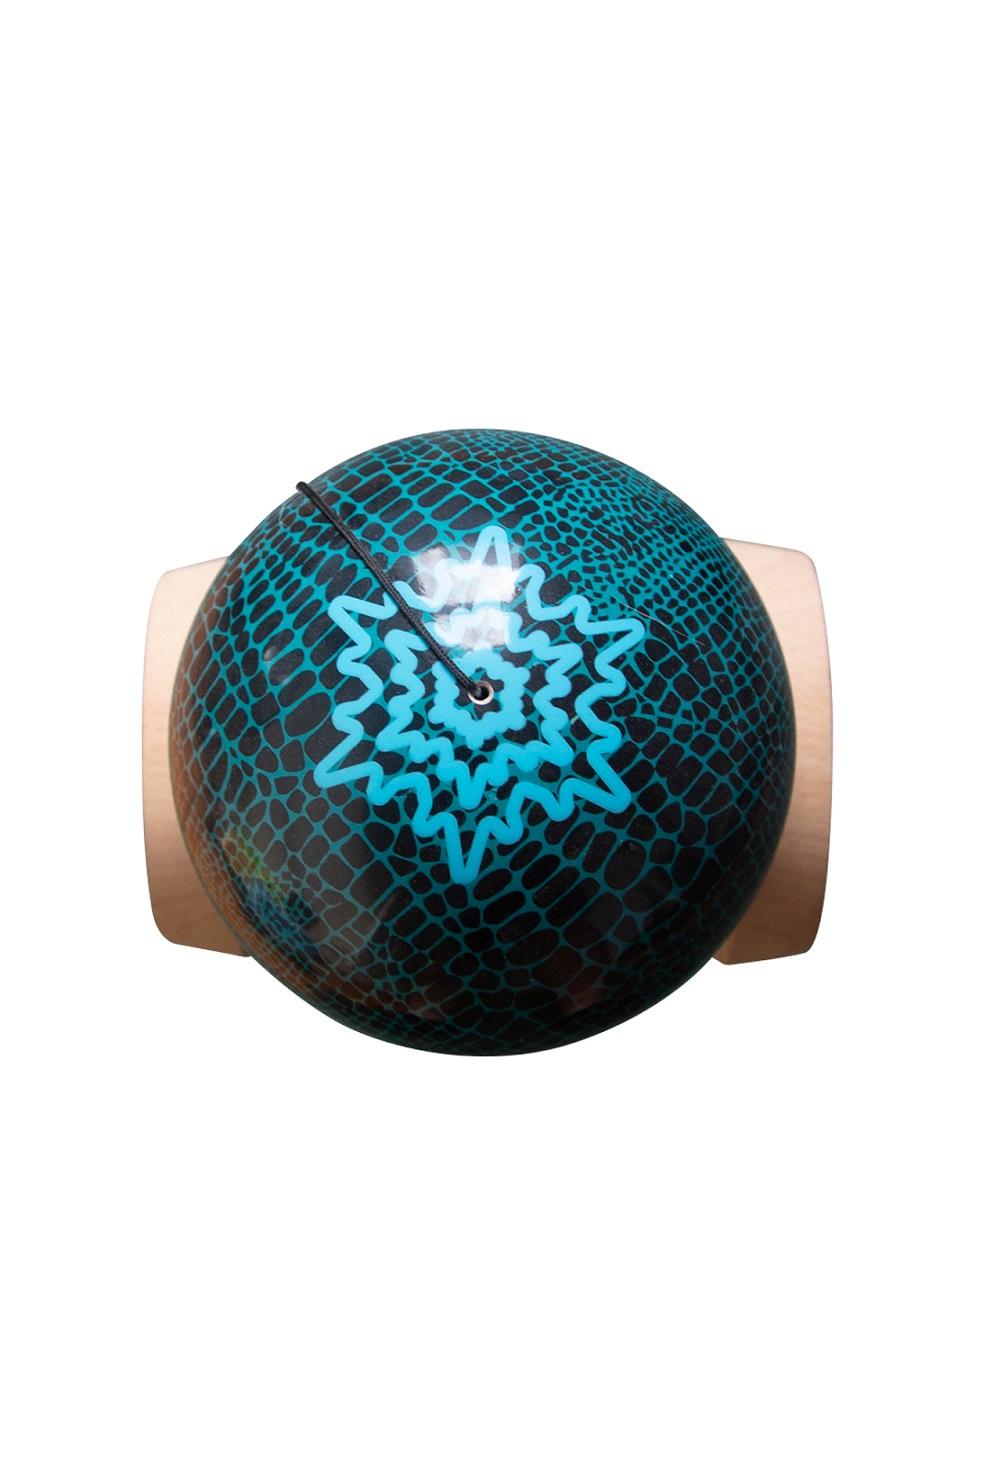 Sweets Kendamas - KAIJU - The Ice Dragon